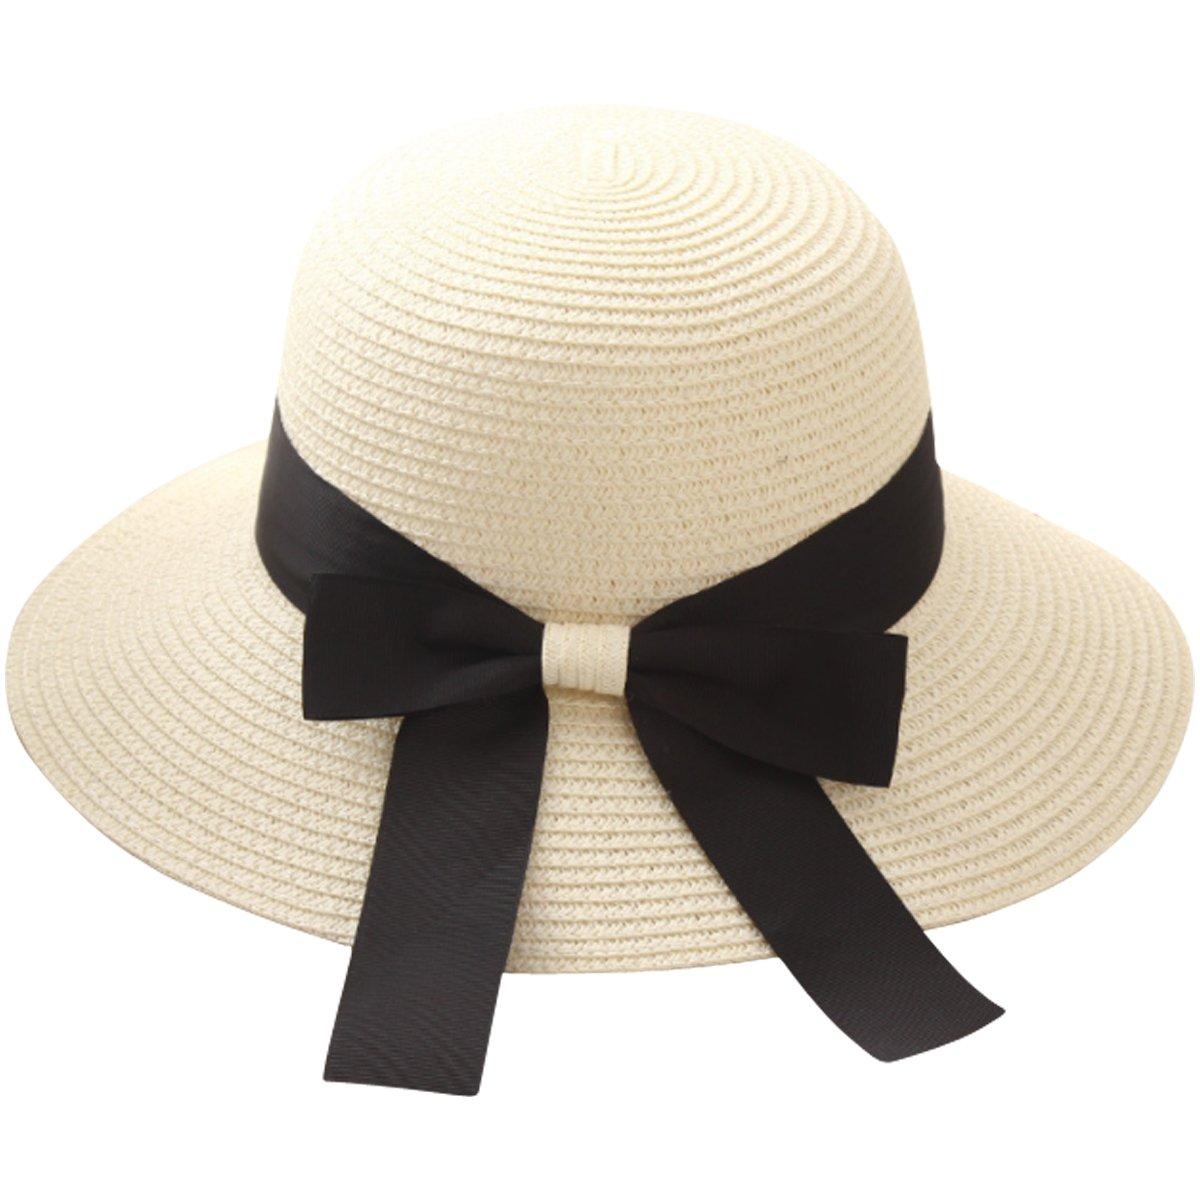 Lanzom Women Wide Brim Straw Panama Roll up Hat Fedora Beach Sun Hat UPF50+ (X-Beige)